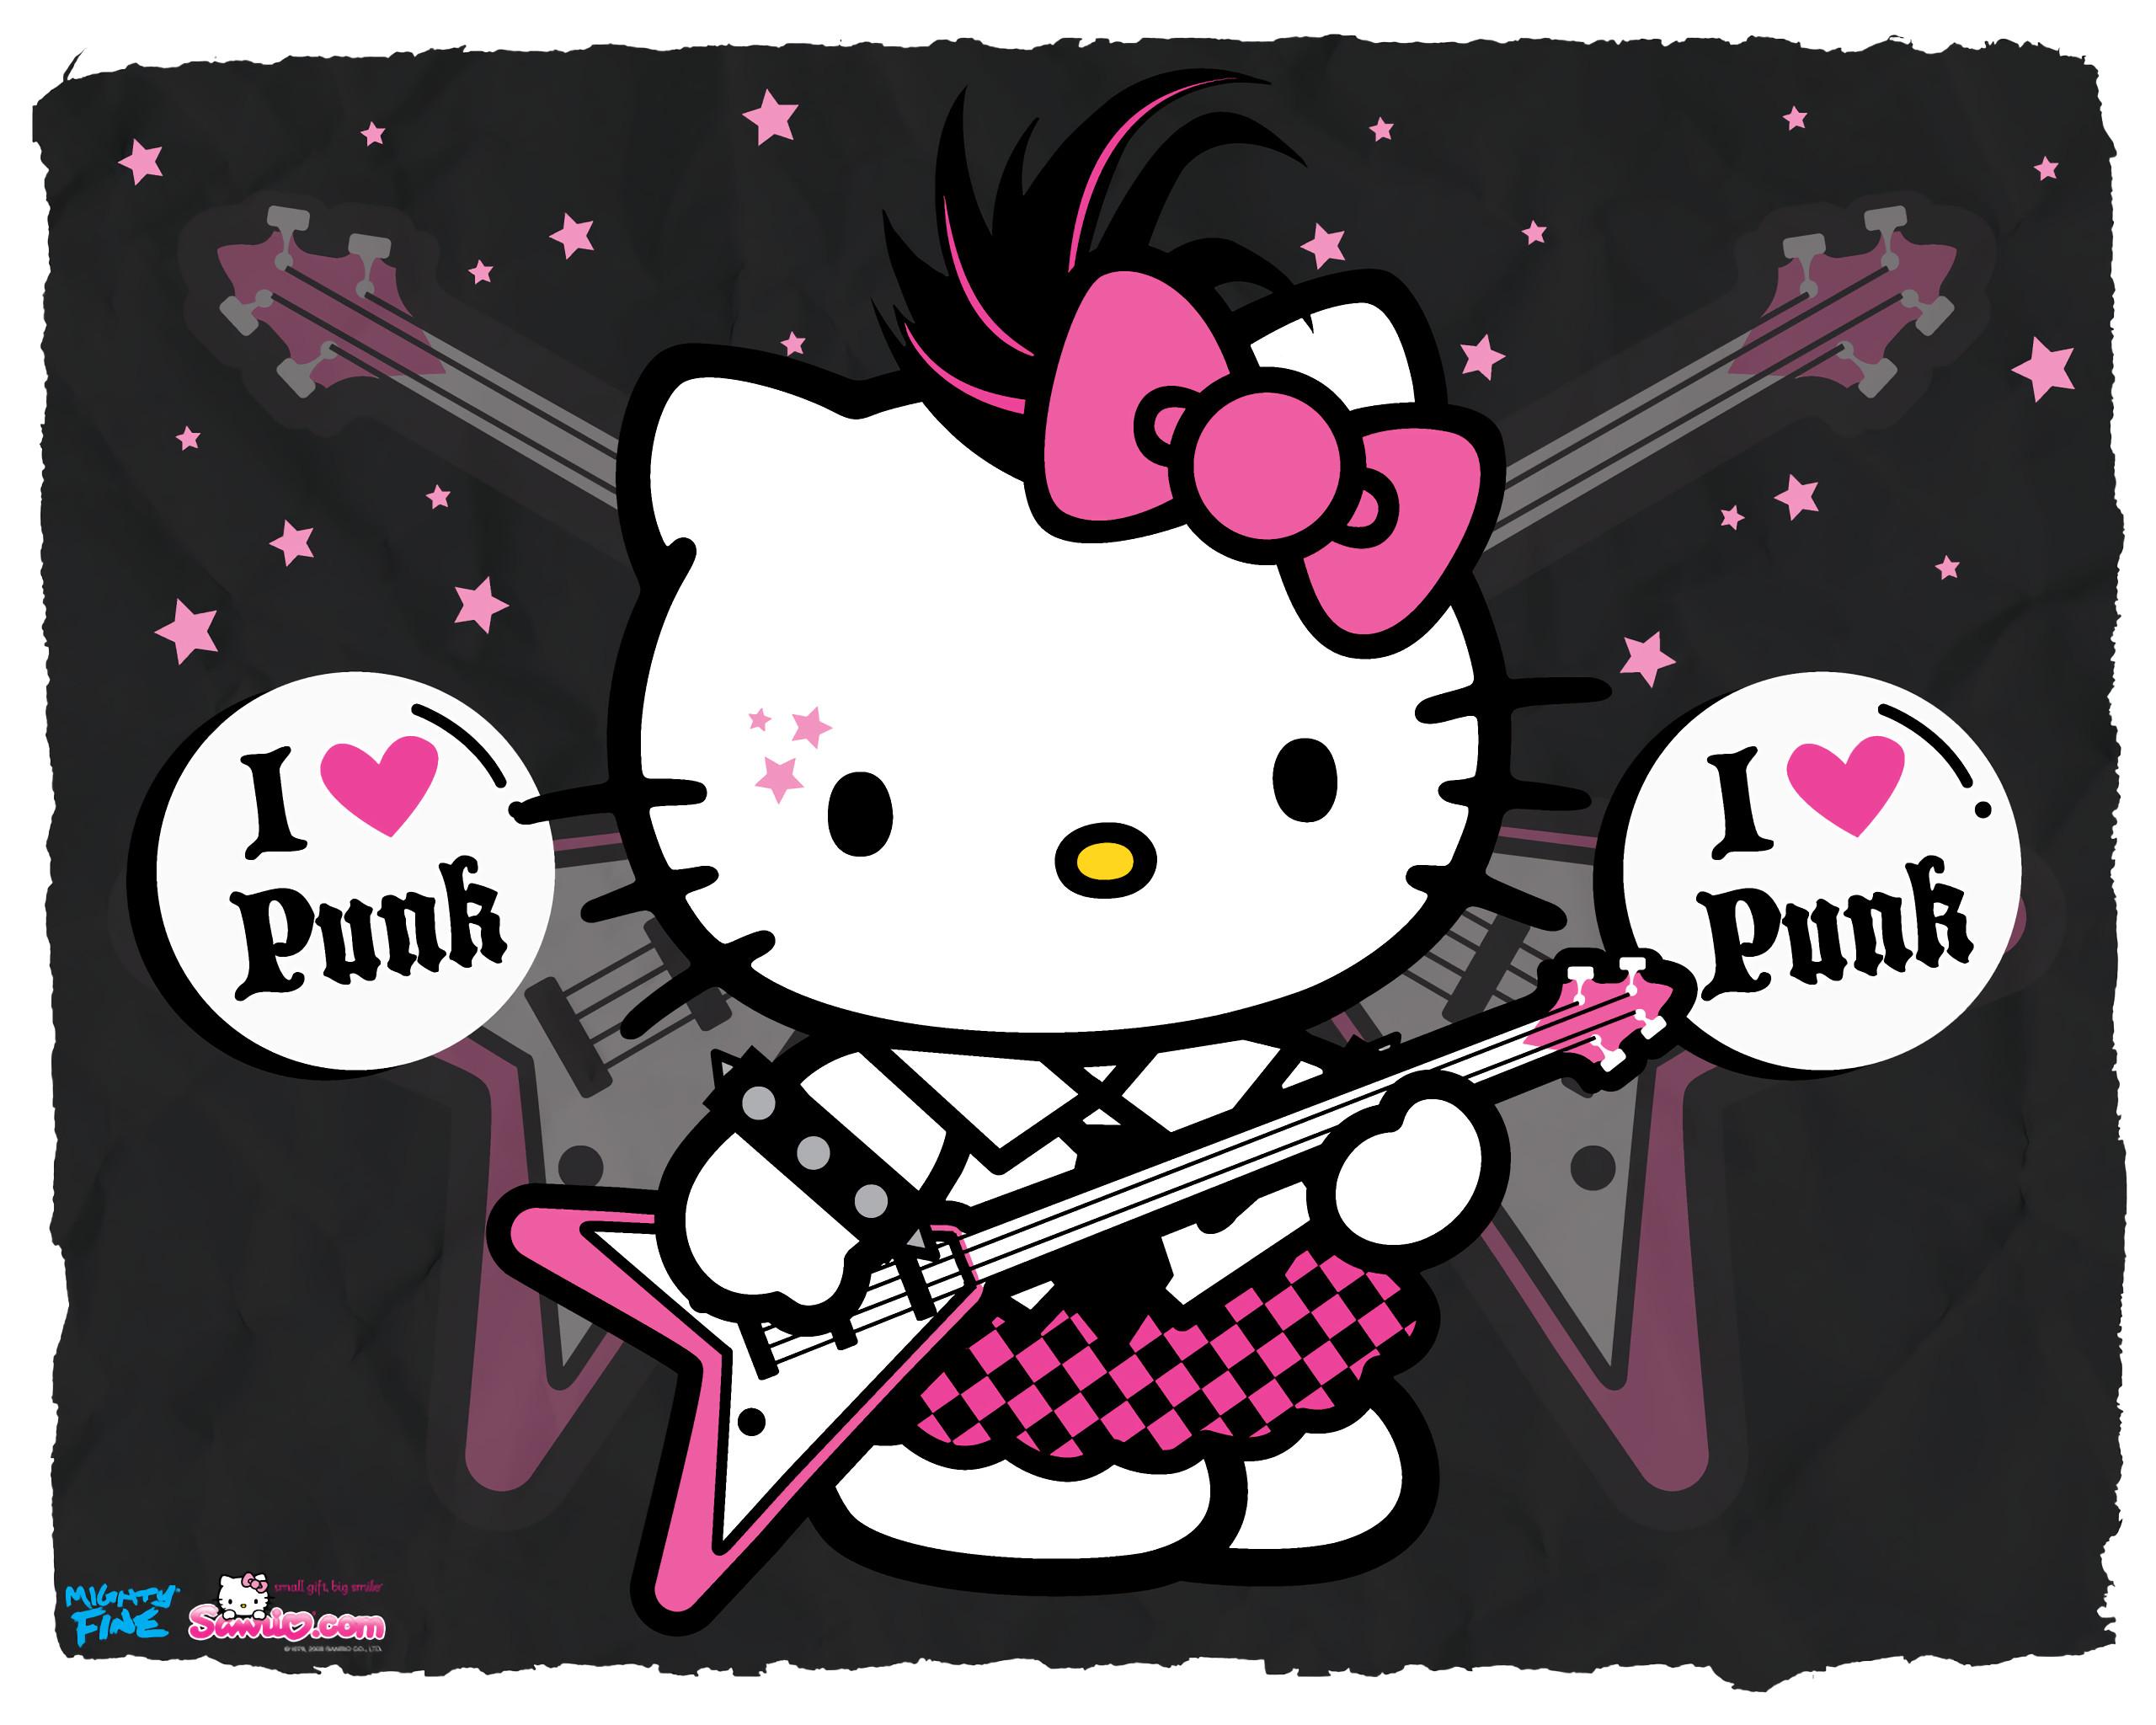 Fantastic Wallpaper Hello Kitty Ipad 2 - 691732-amazing-black-hello-kitty-background-2560x2048-full-hd  Best Photo Reference_29513.jpg